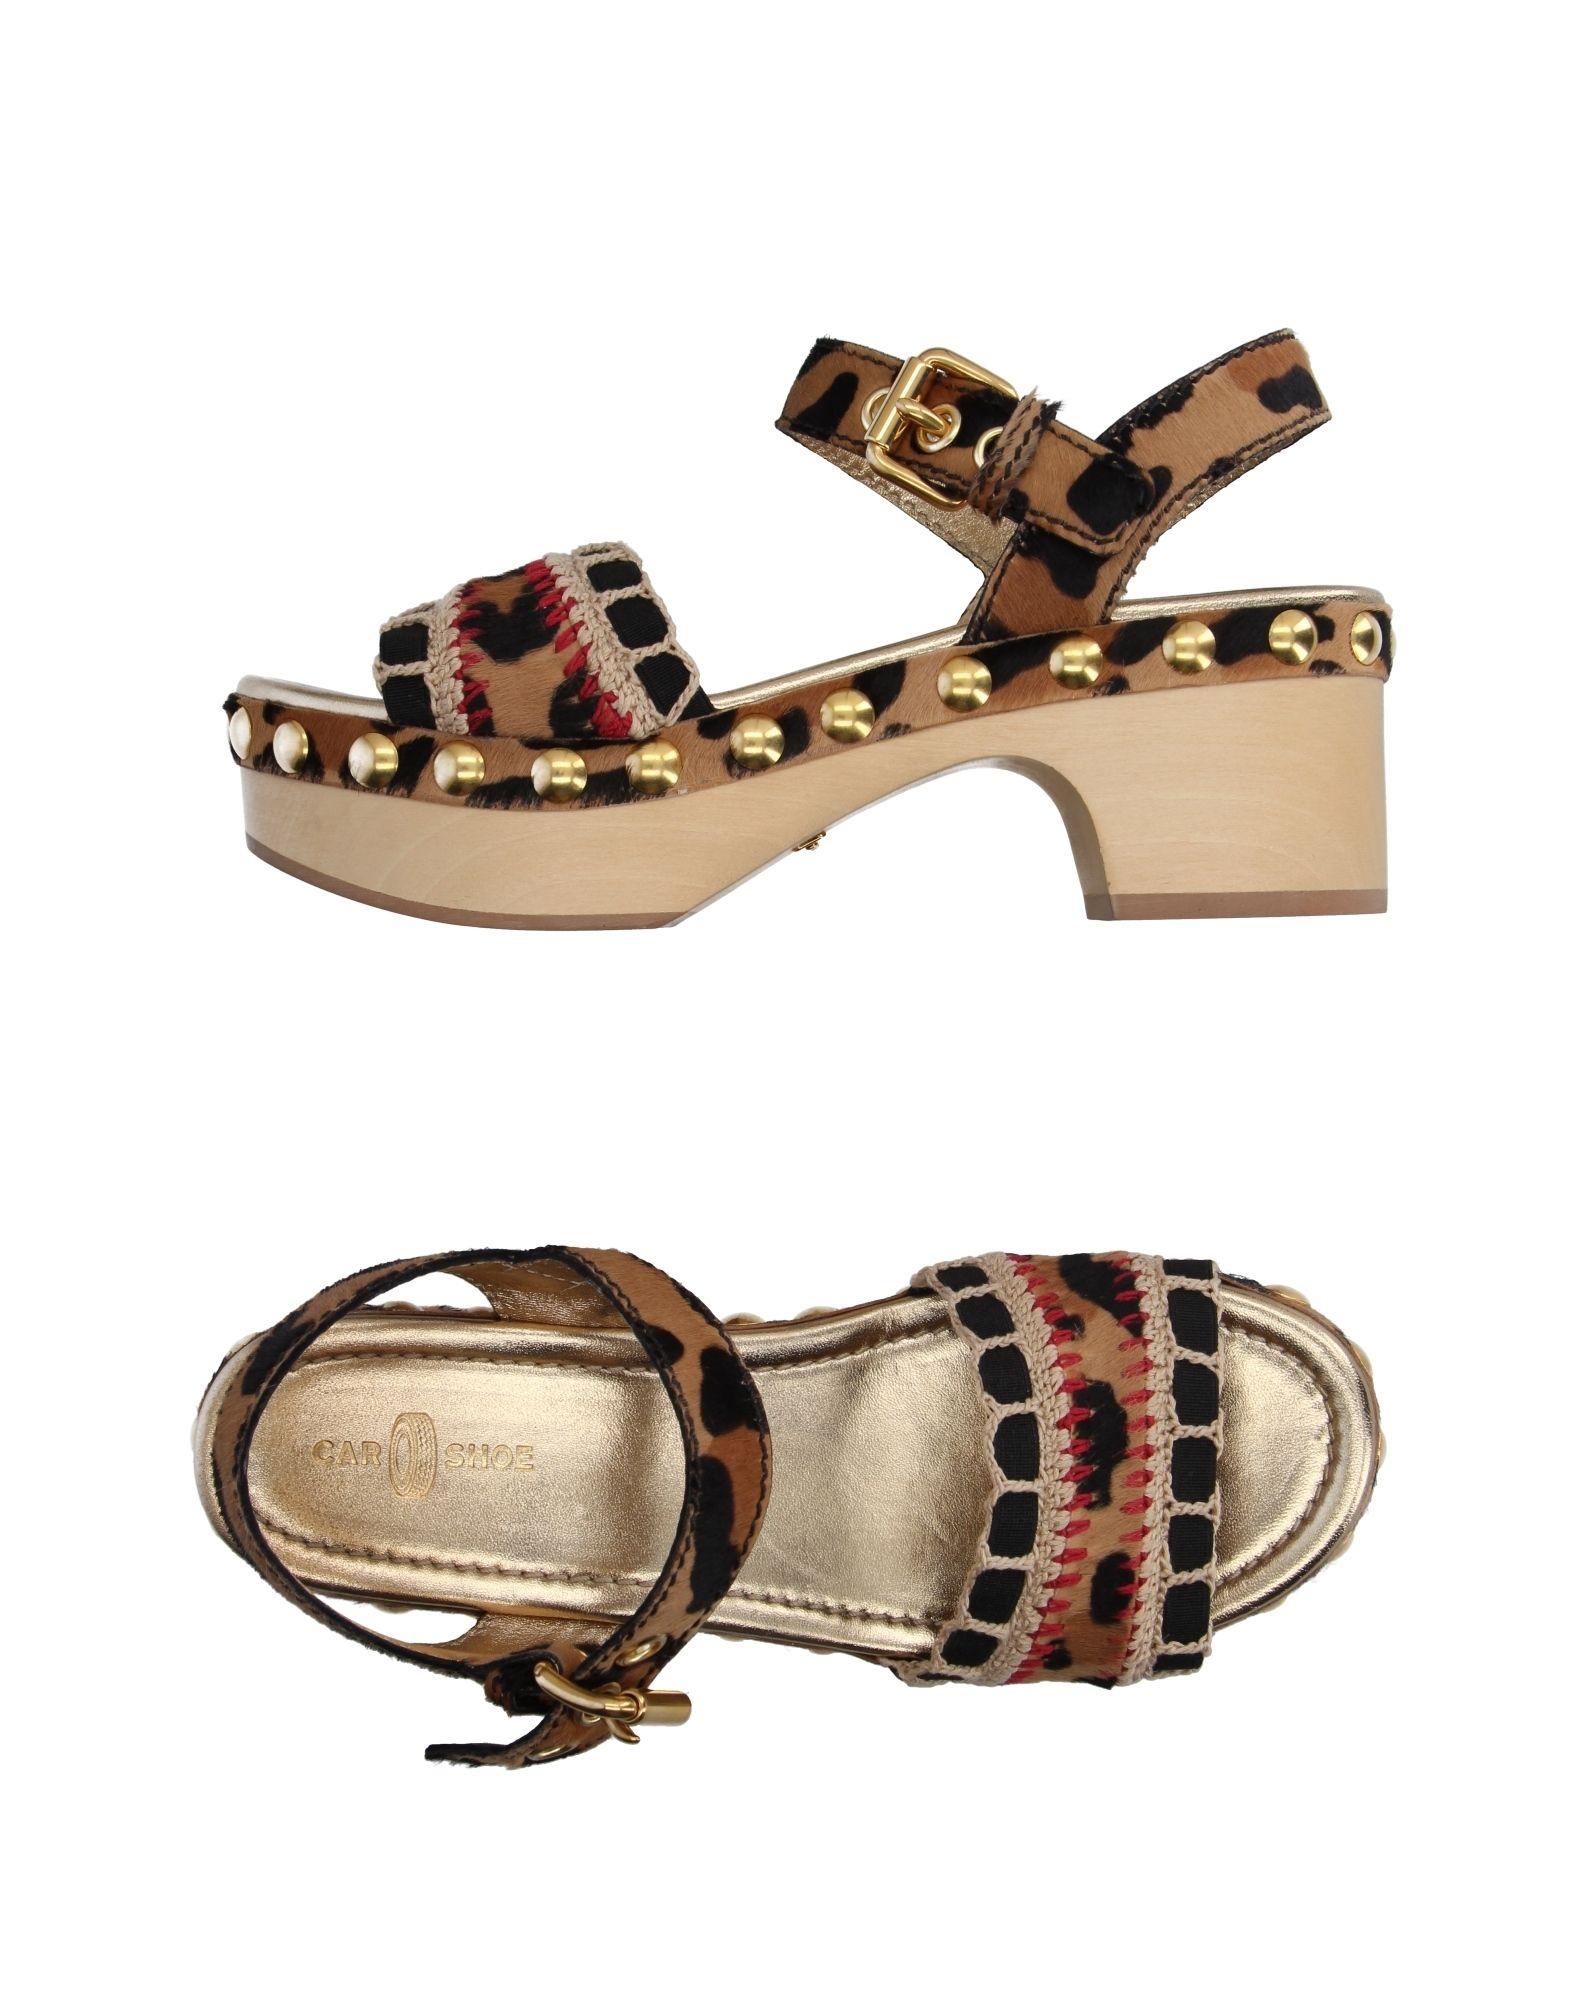 Stilvolle Damen billige Schuhe Carshoe Sandalen Damen Stilvolle  11099463JF 5a6566